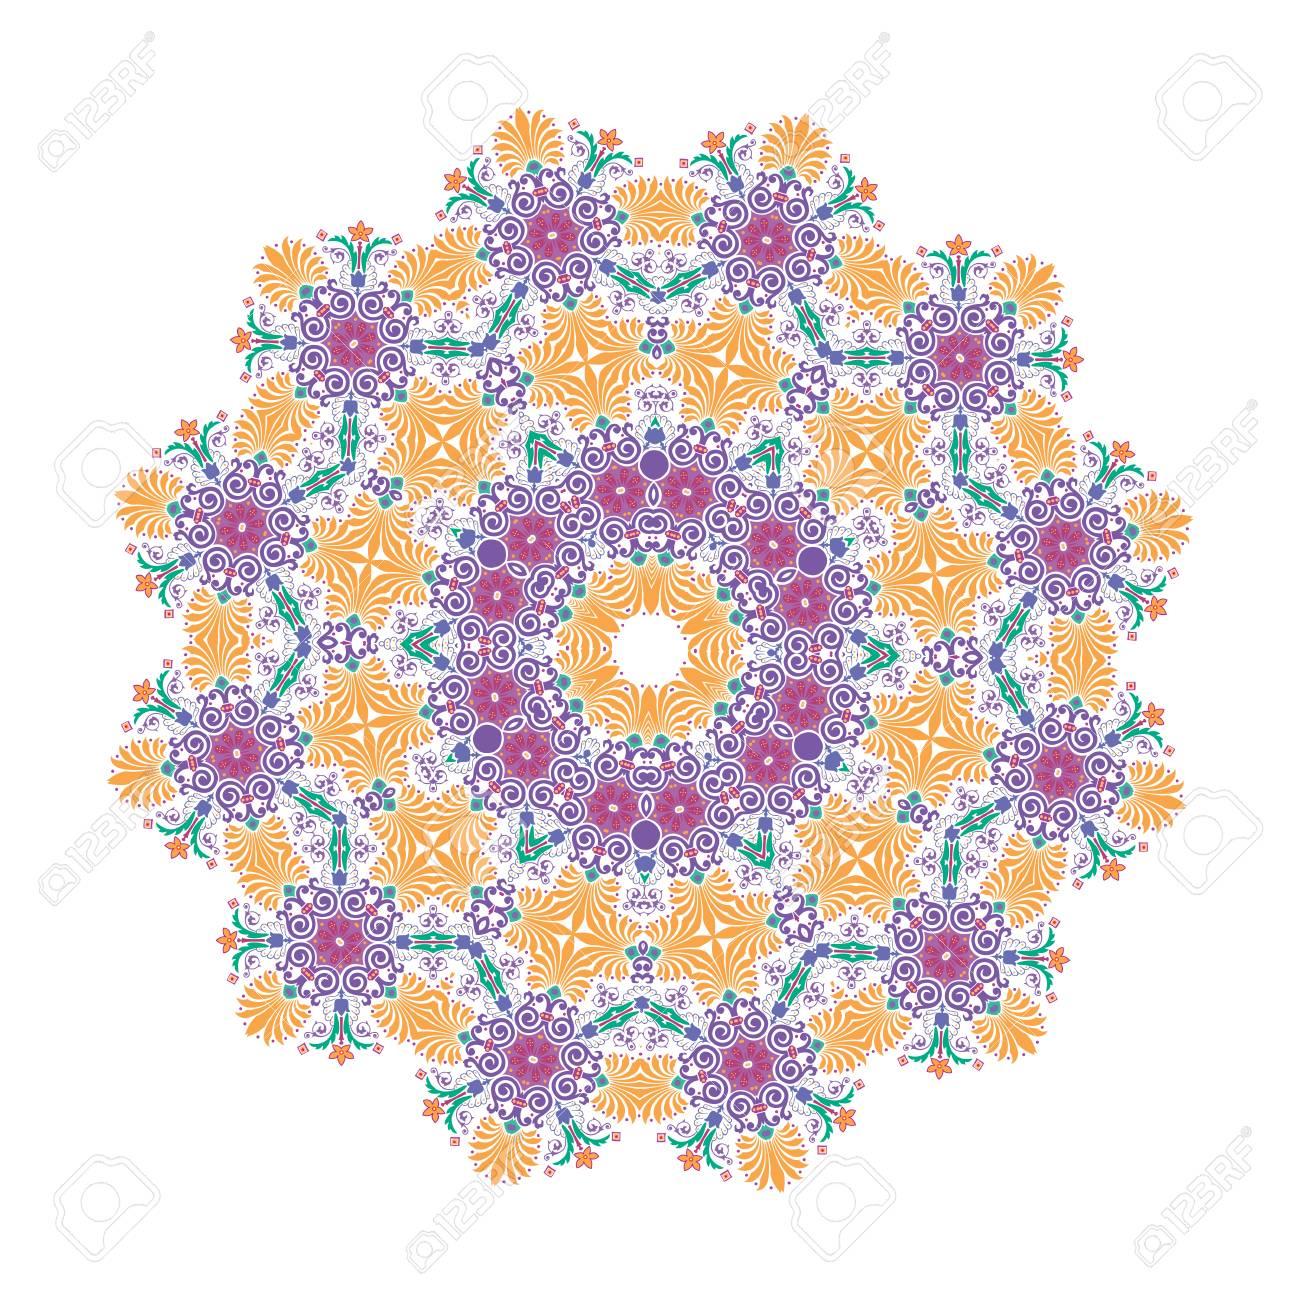 Mandala, Vector Mandala, floral mandala, flower mandala, oriental mandala, coloring mandala. Oriental pattern, vector illustration. Islam, Arabic, Indian, turkish, pakistan, chinese, ottoman motifs - 114709823